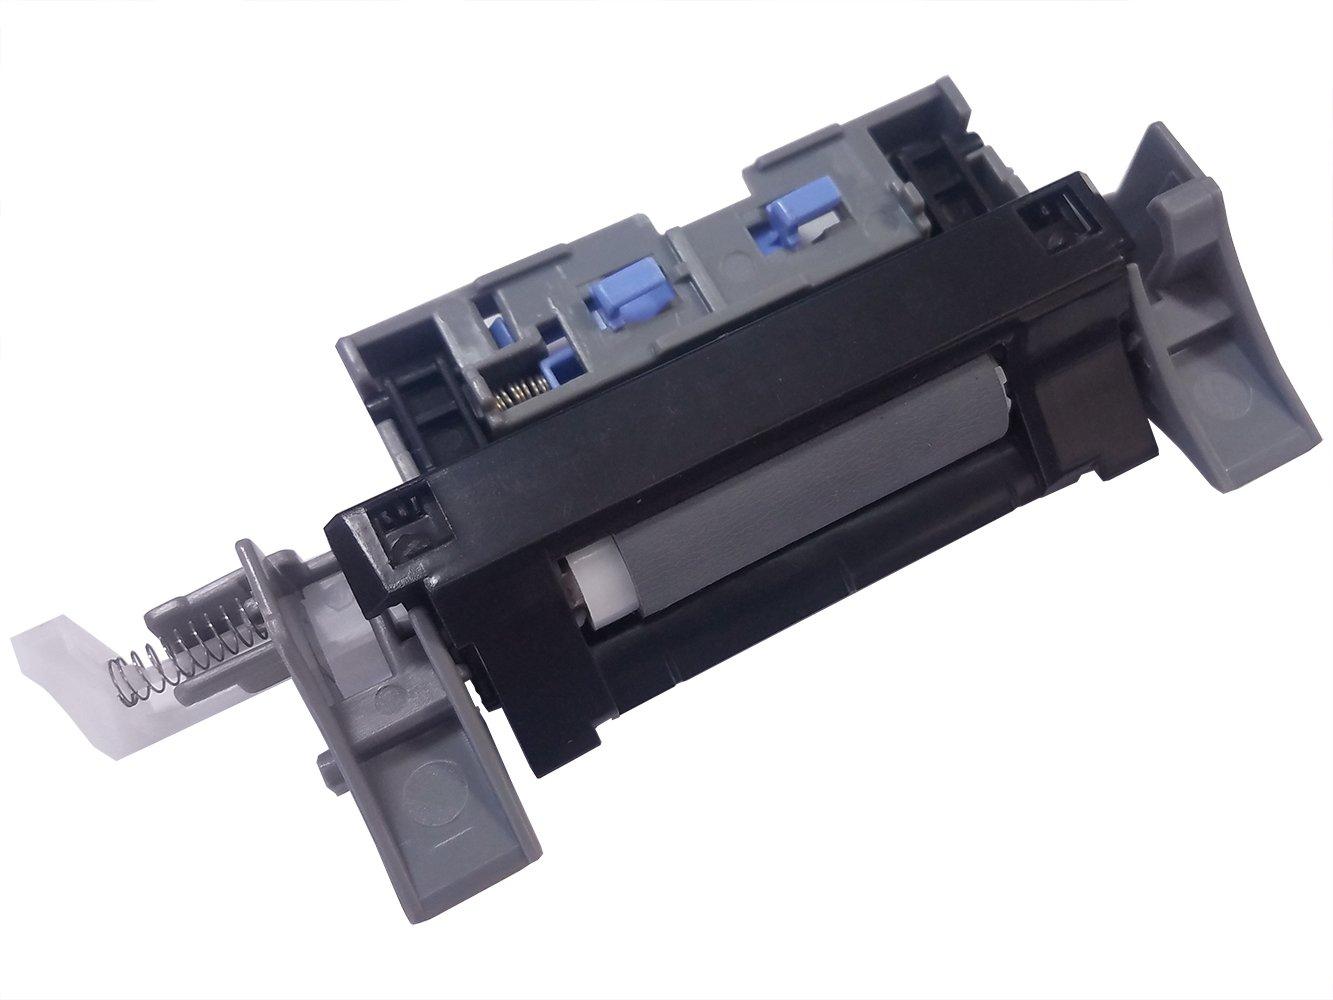 Transfer Roller /& Tray 1-3 Rollers ITB Deluxe Transfer Kit for HP Laserjet CP5225 // CP5525 // M750 // M775 with Intermediate Transfer Belt CE979A, CE710-69003, CC522-69003 Altru Print CE516A-TK-AP